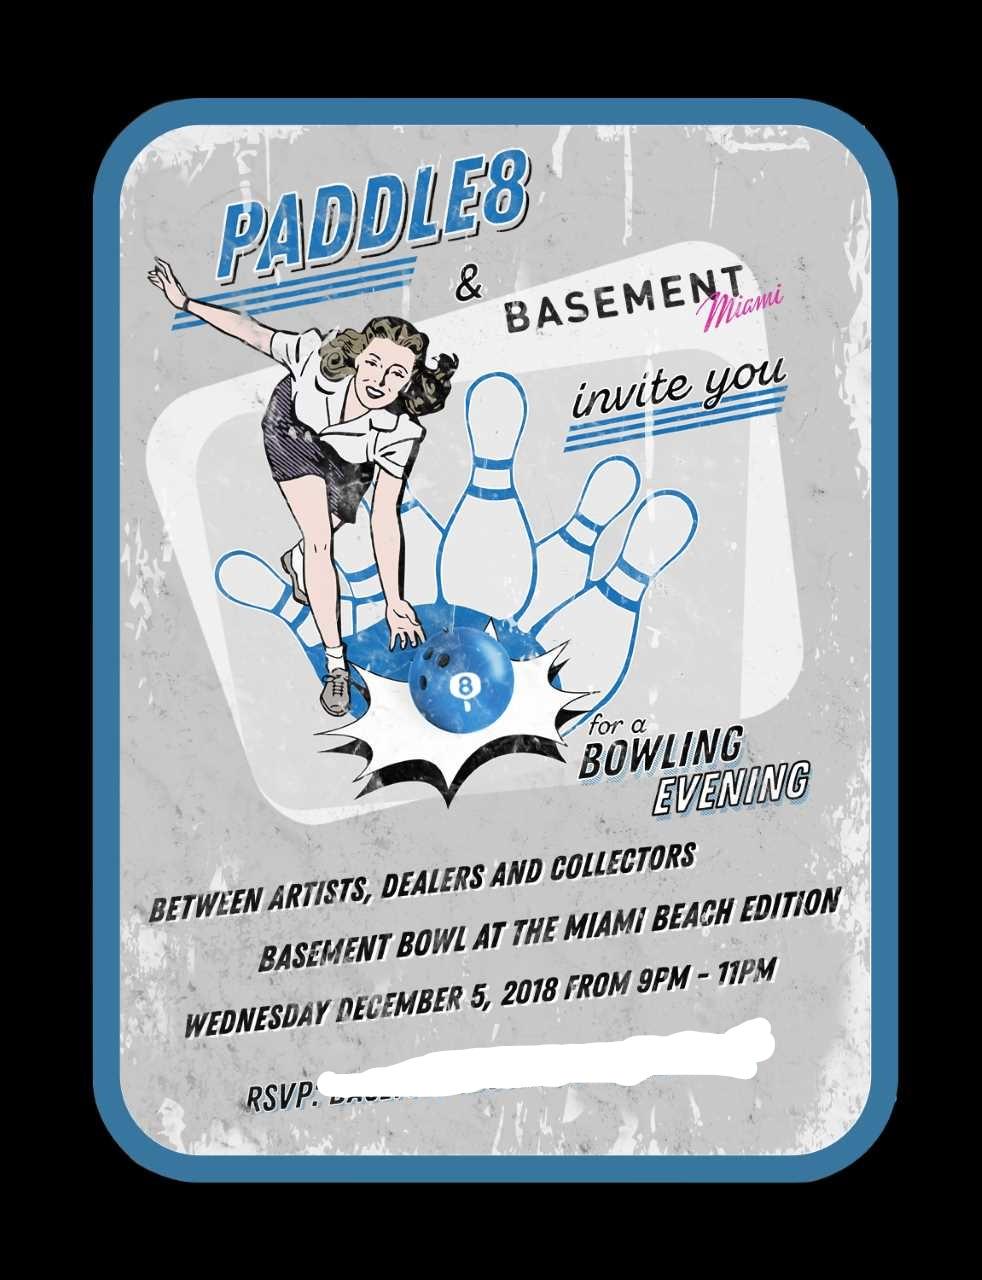 paddle8 basement bowl the edition hotel miami art basel 2018 - florum fashion magazine_LI.jpg